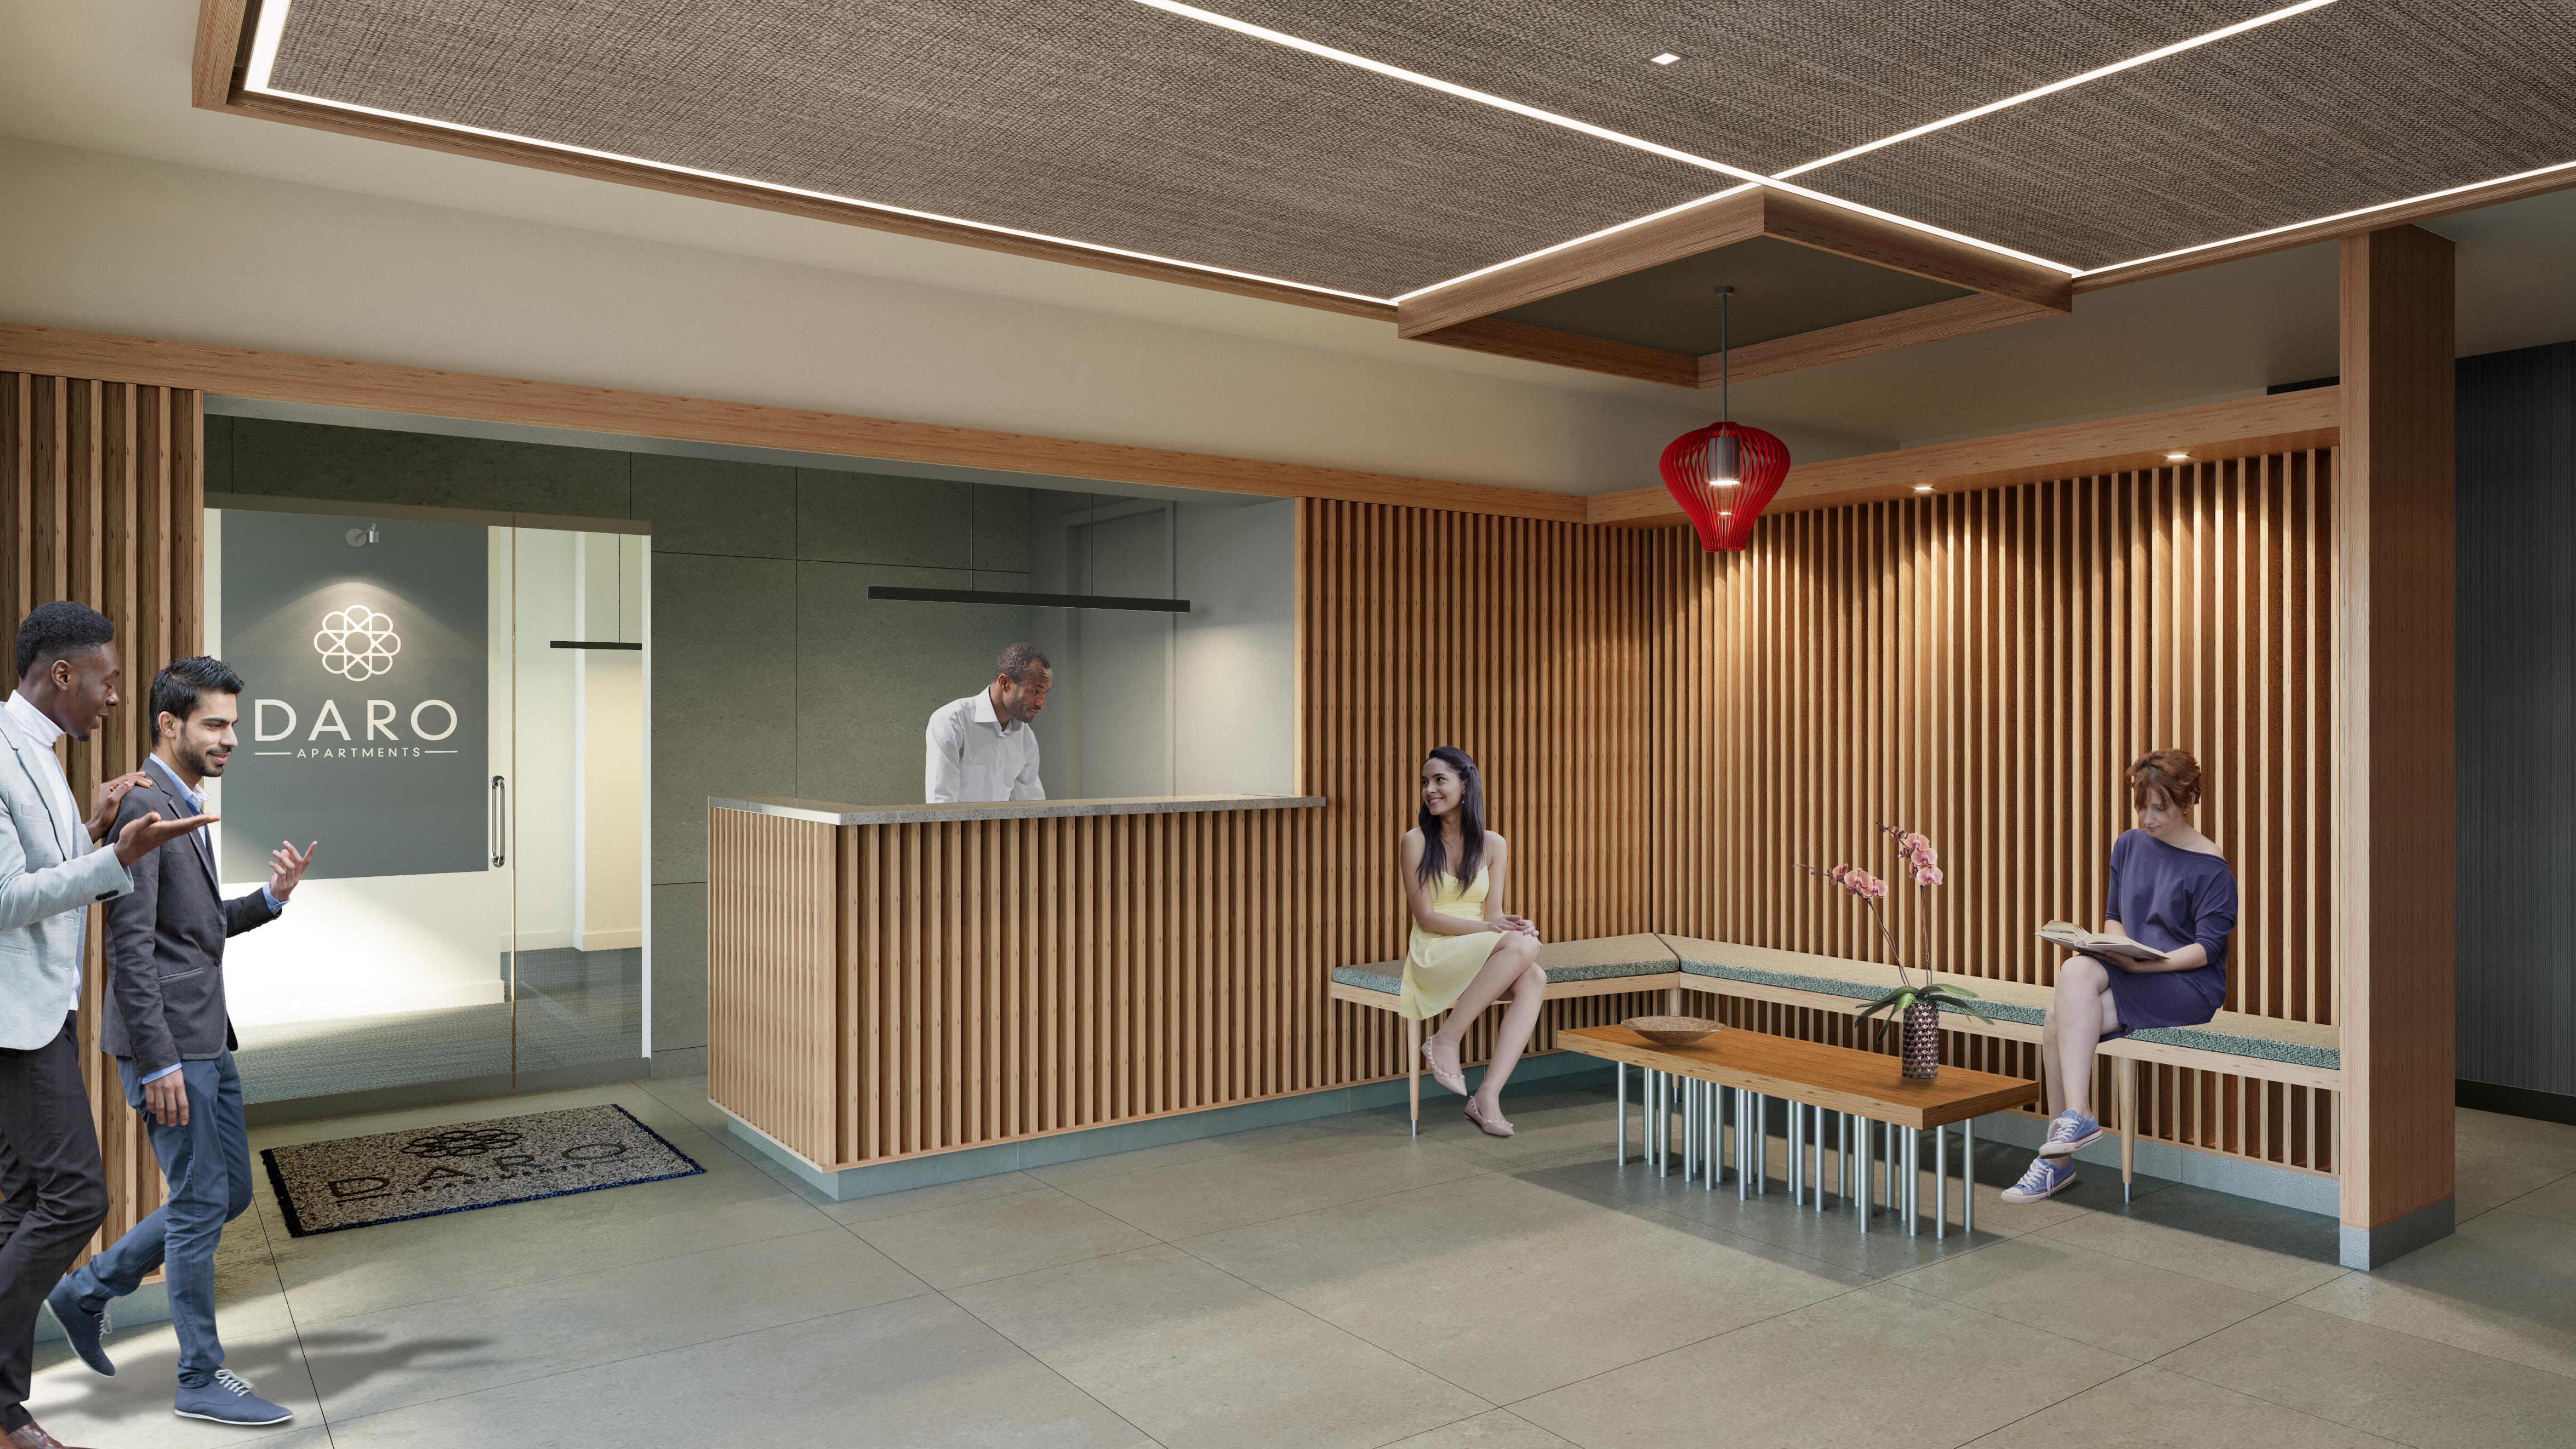 DC Lobby & Hallway - 2